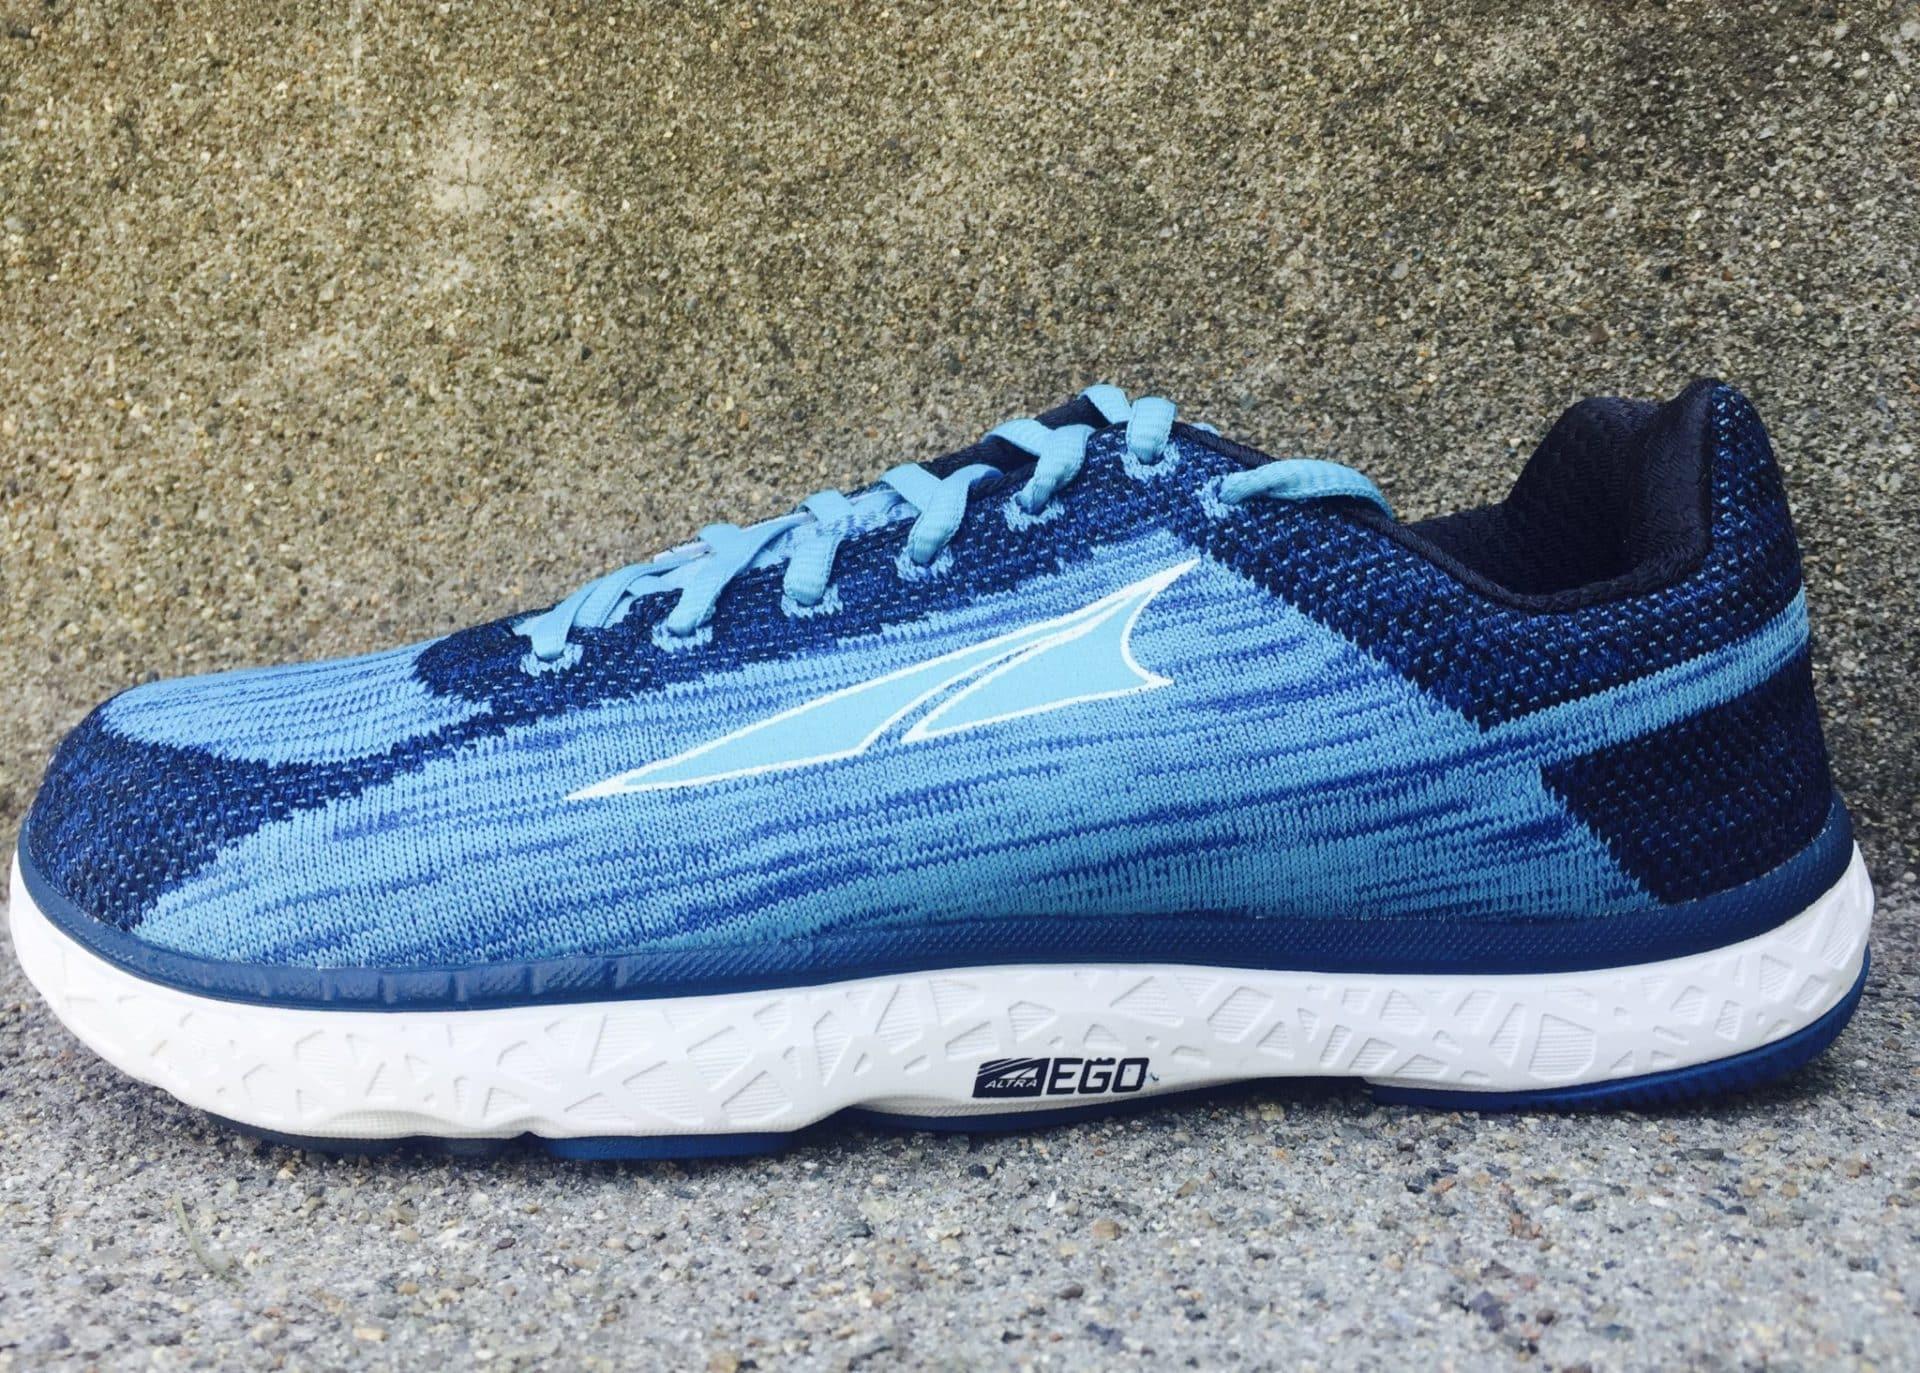 12mm drop running shoes